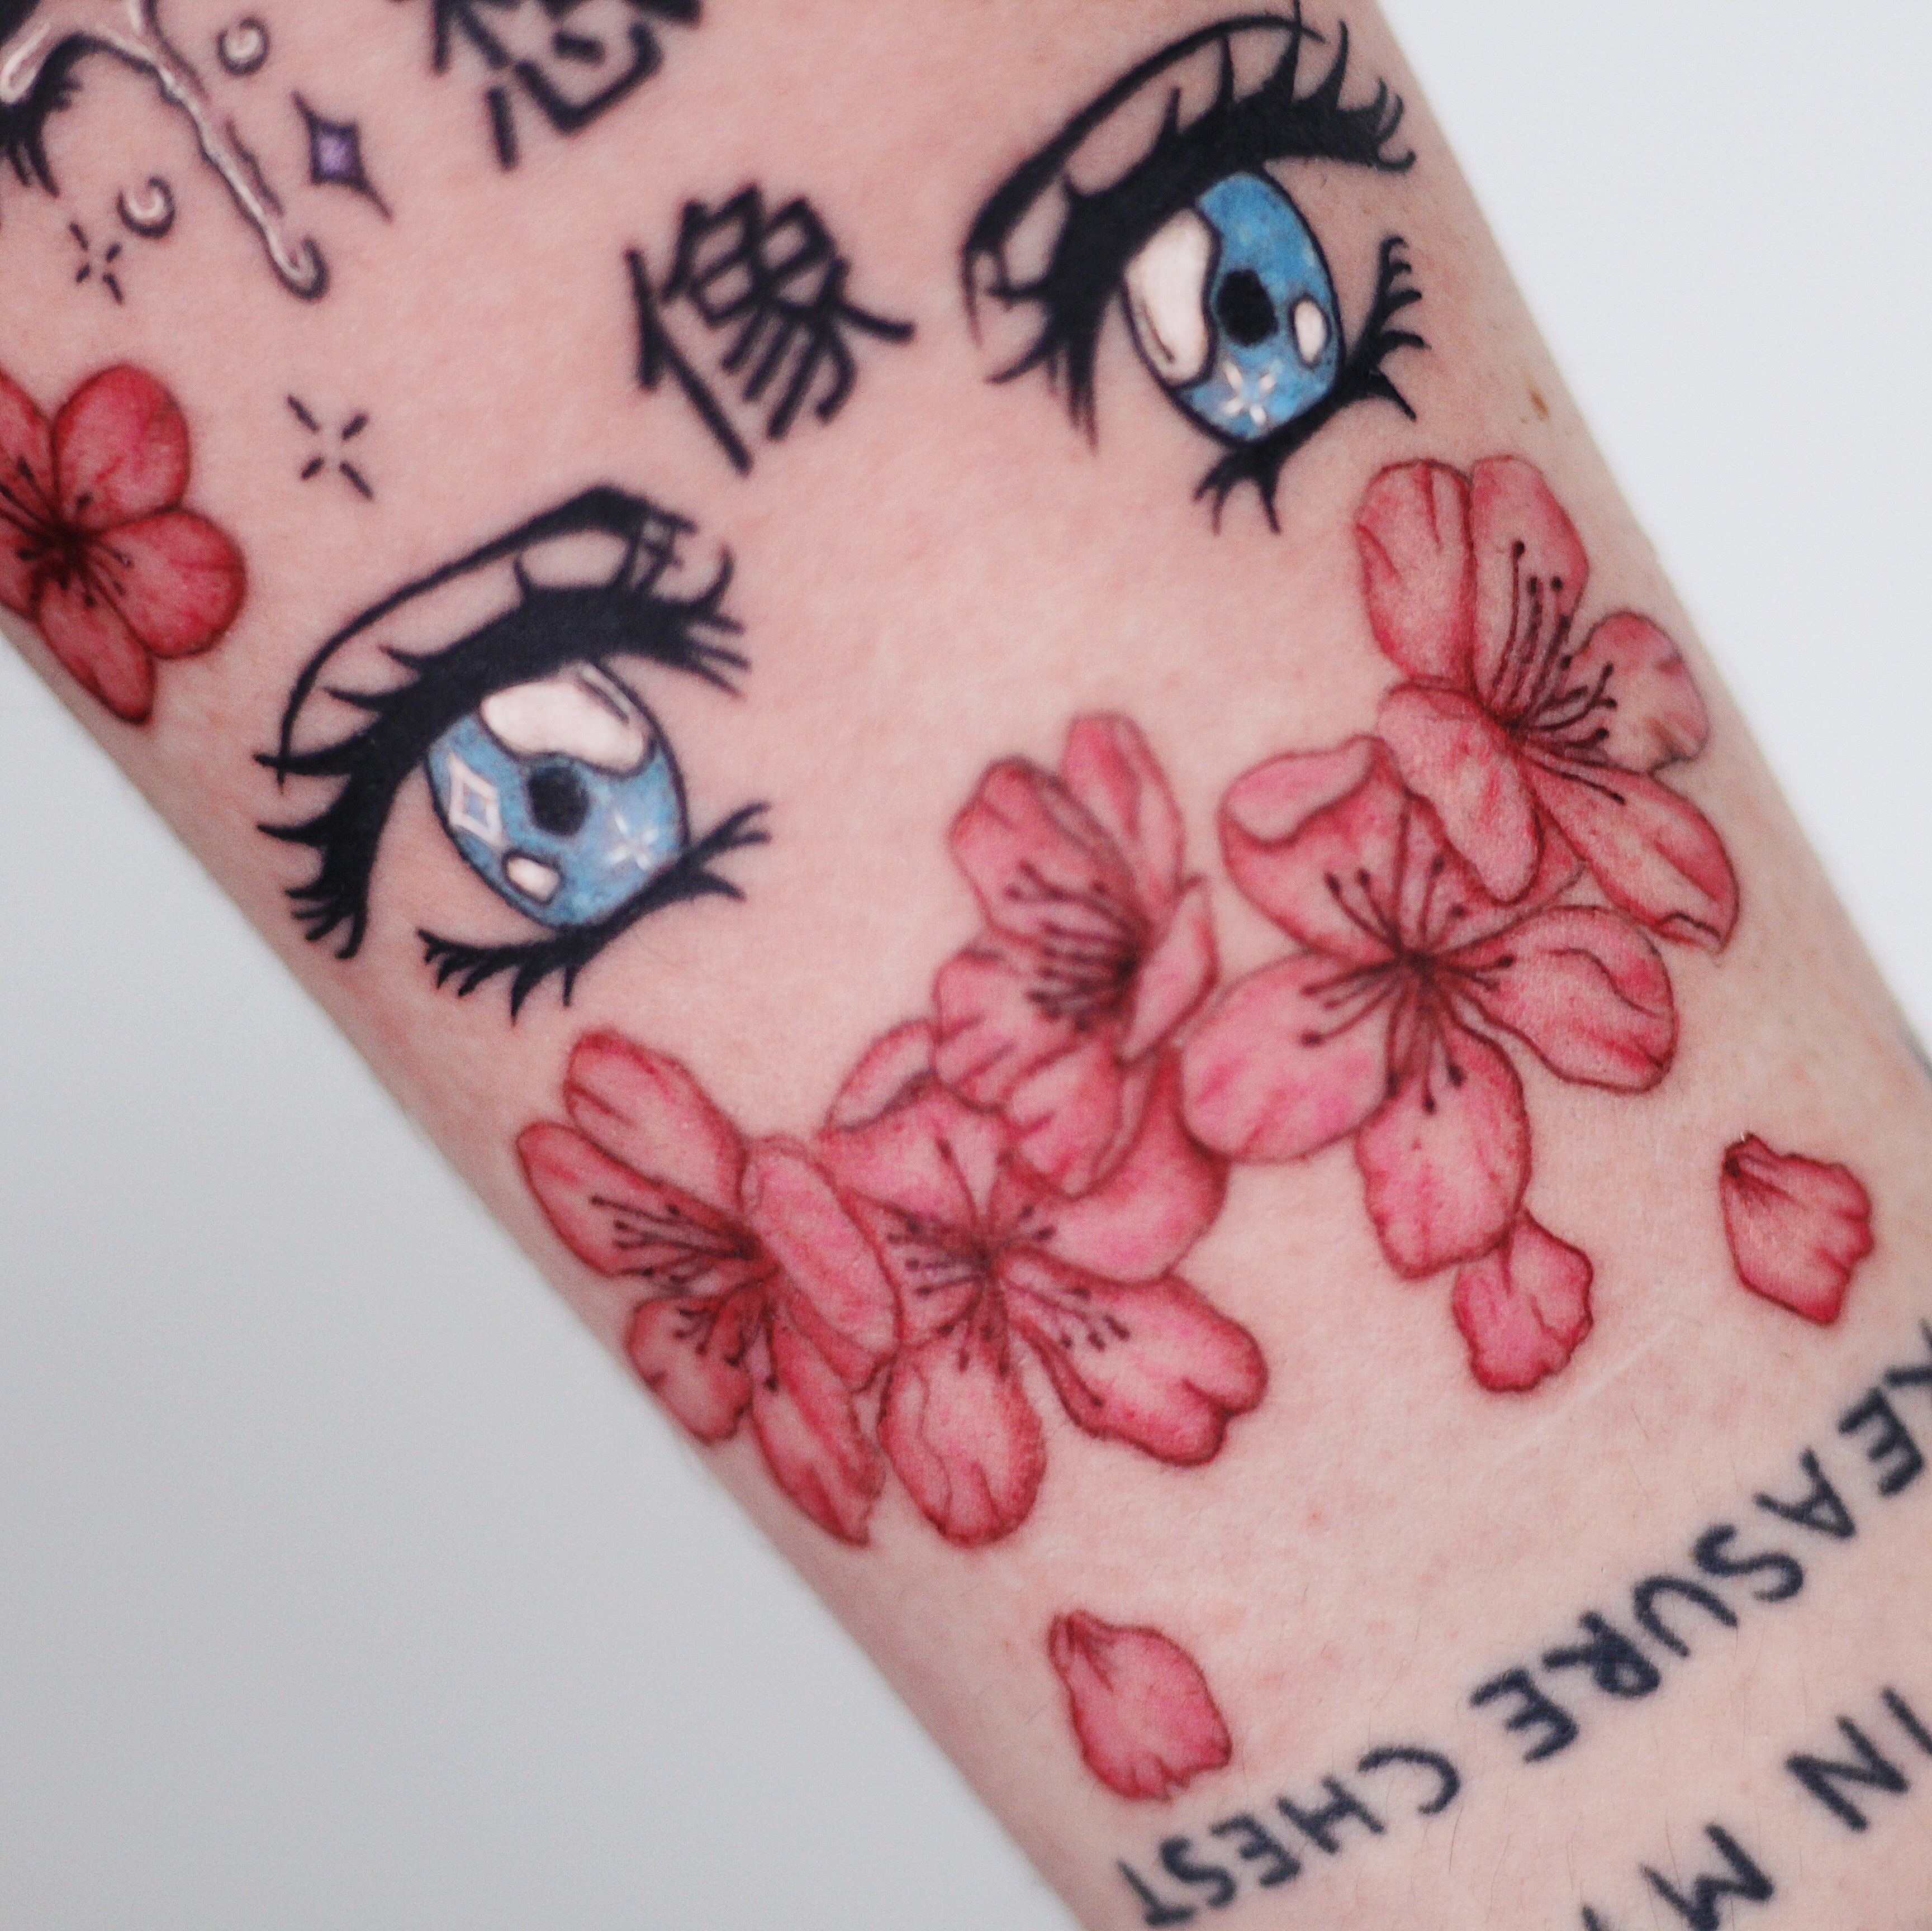 Anime Manga Tattoo Done By Etherea Tattoo Tatuaggio Cartone Anime Eyes Eye Tattoo Special Tattoos Pretty Tattoos